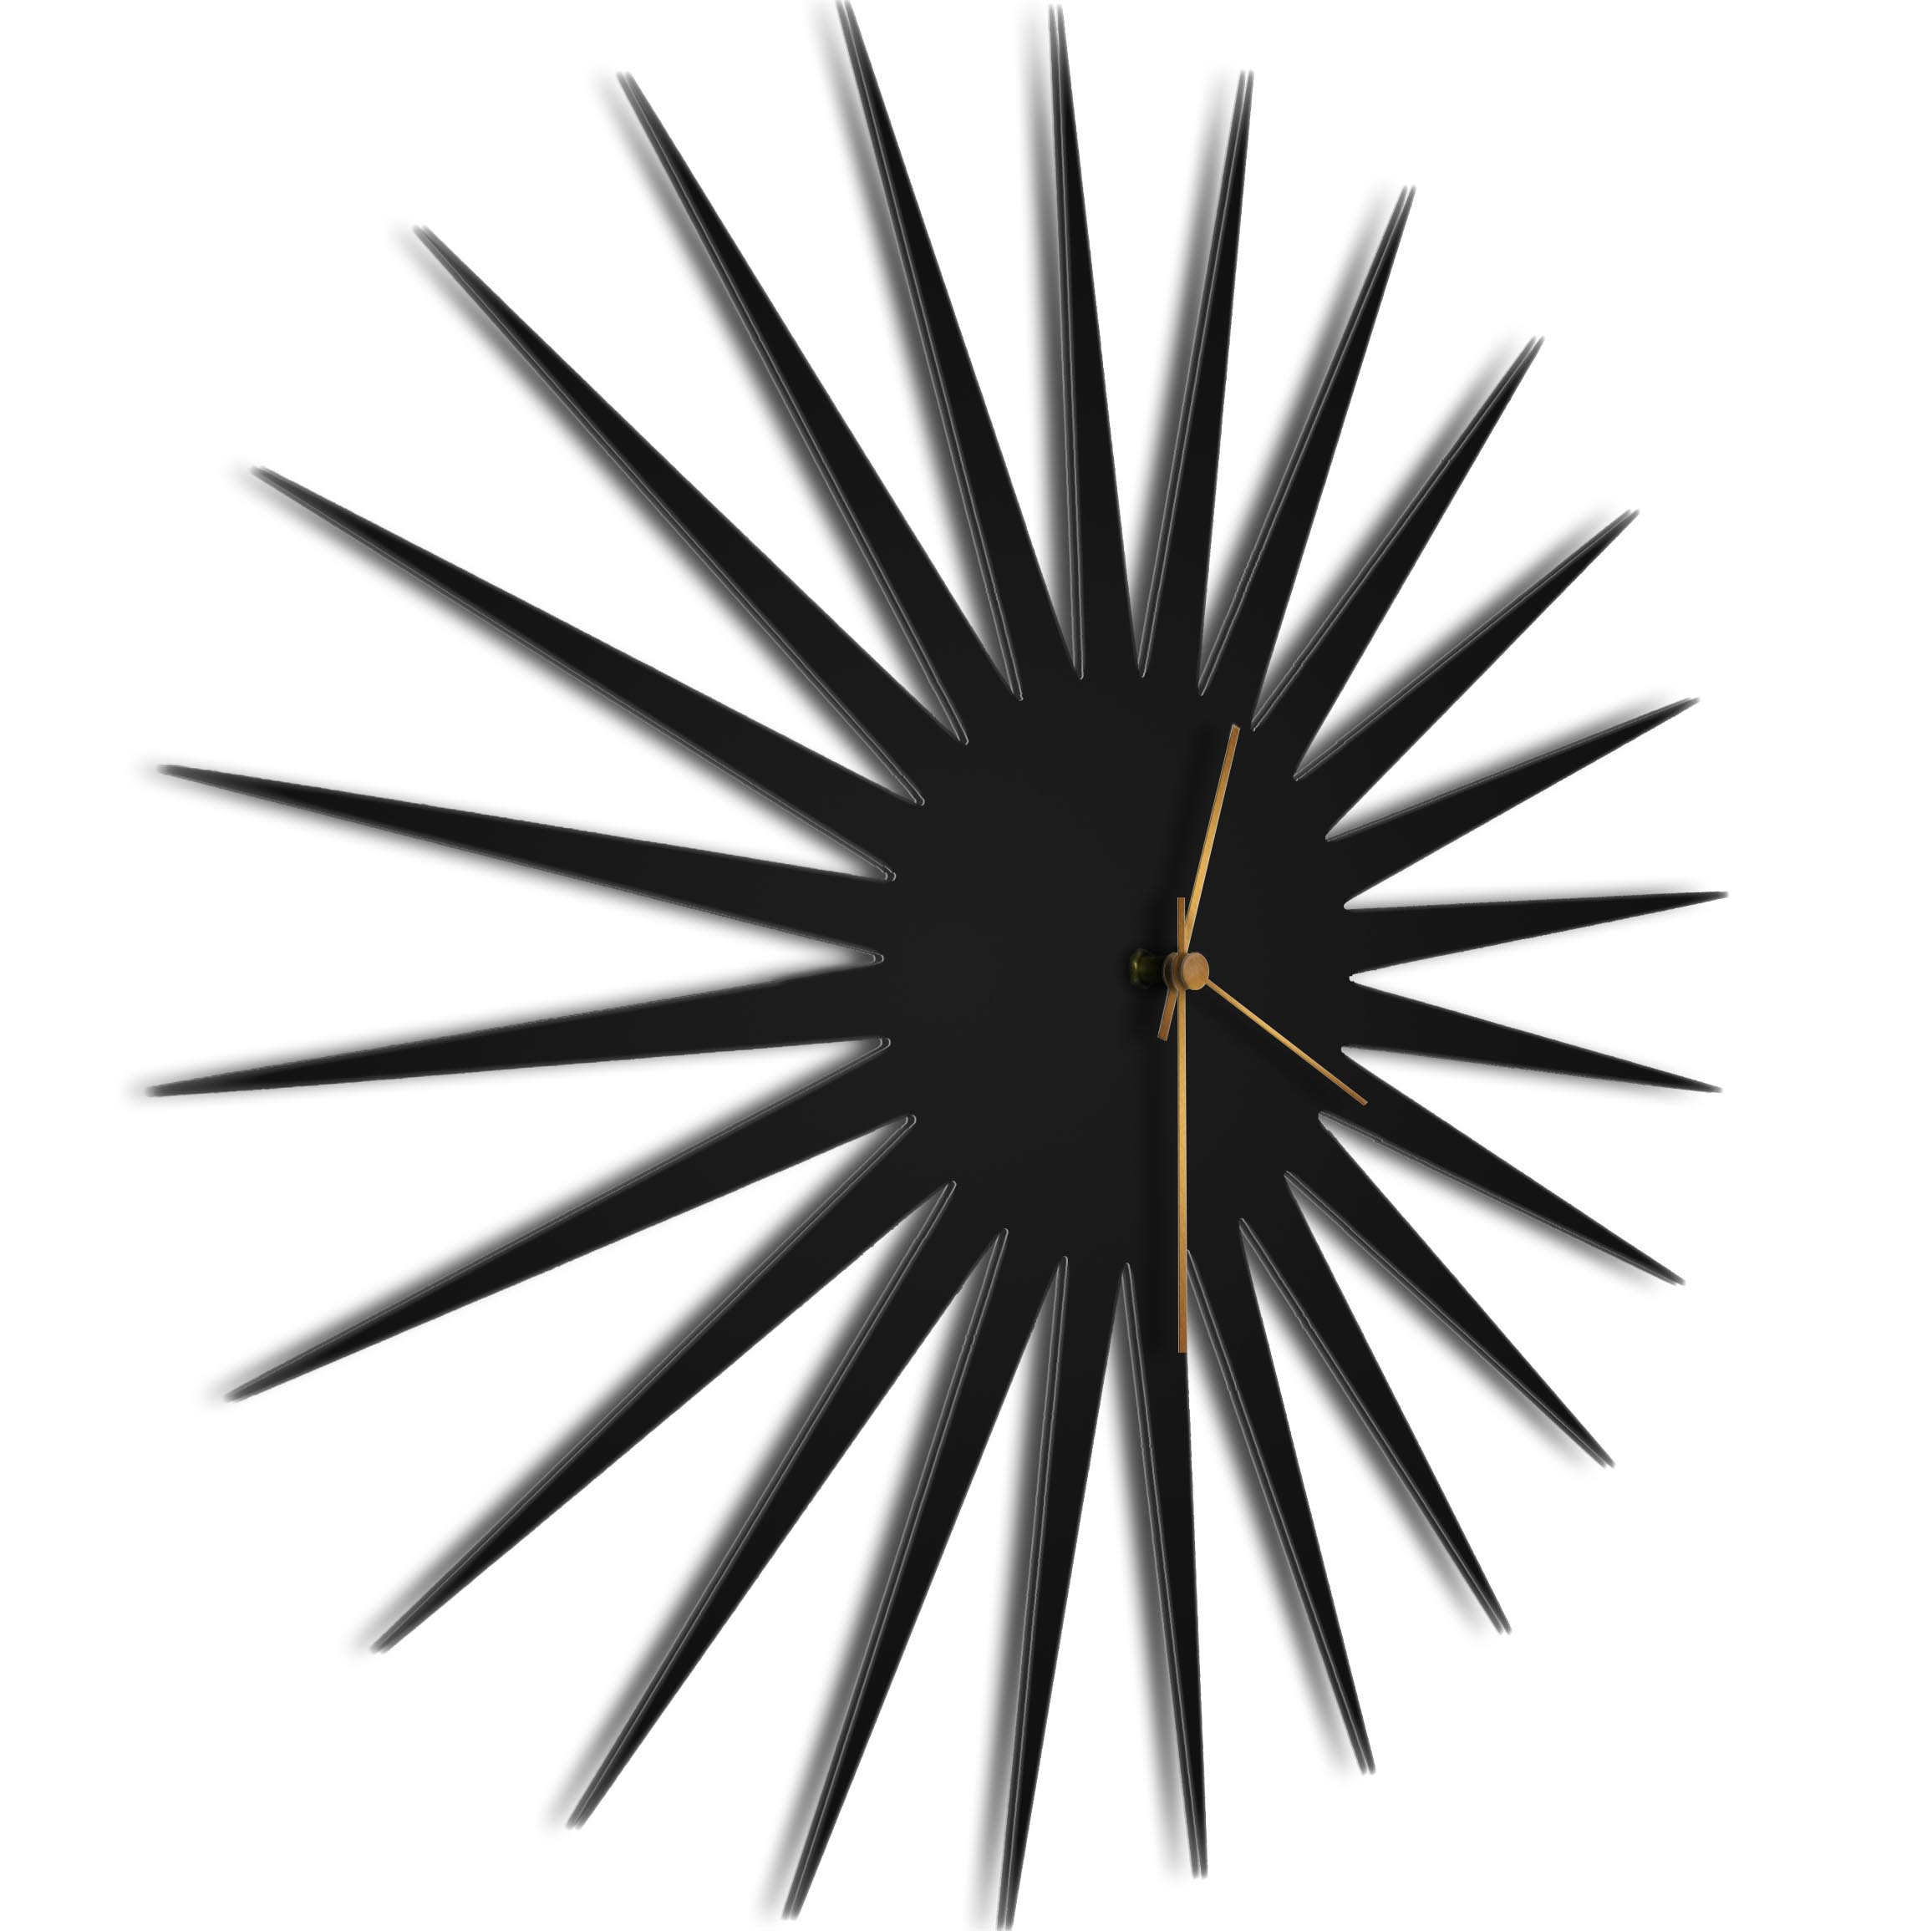 MCM Starburst Clock Black Bronze - Image 2